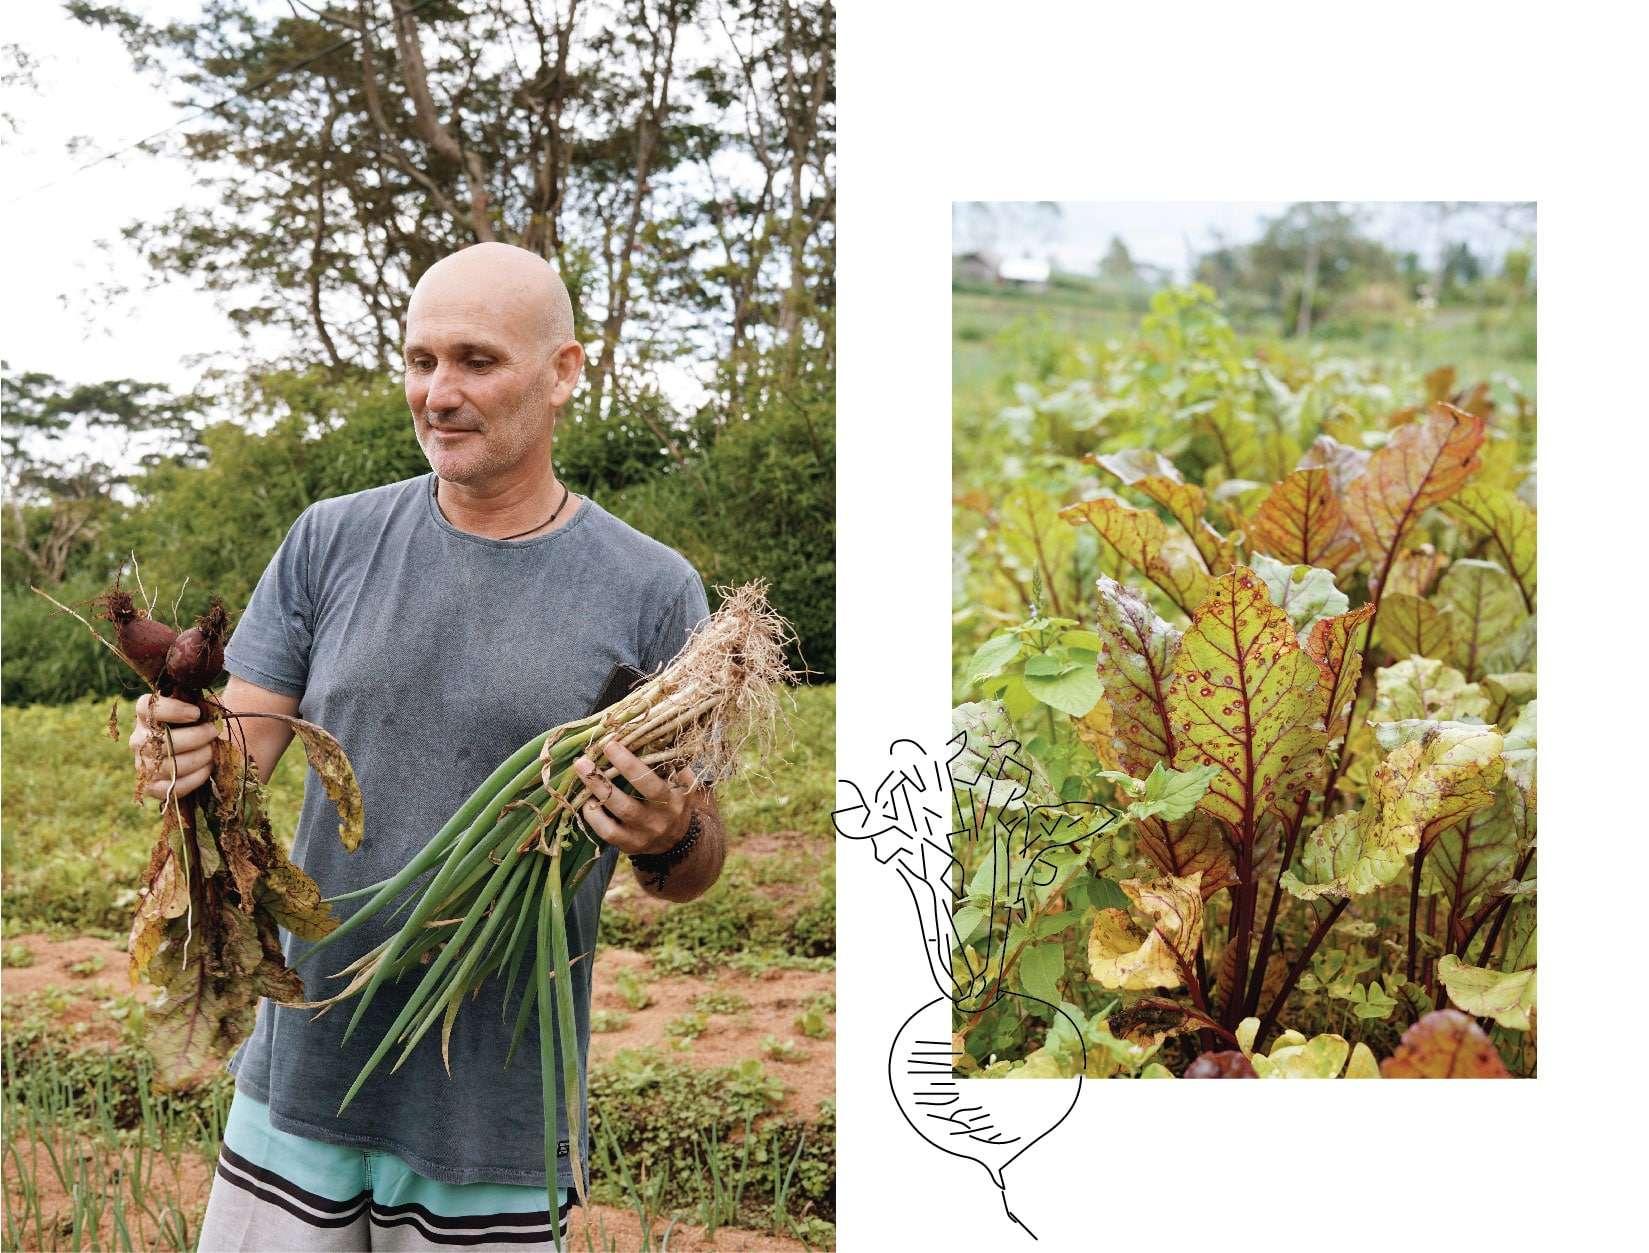 Bali Direct Organic Farm Tour Bukit Mesari Local Produce Beets Green Onion Chef